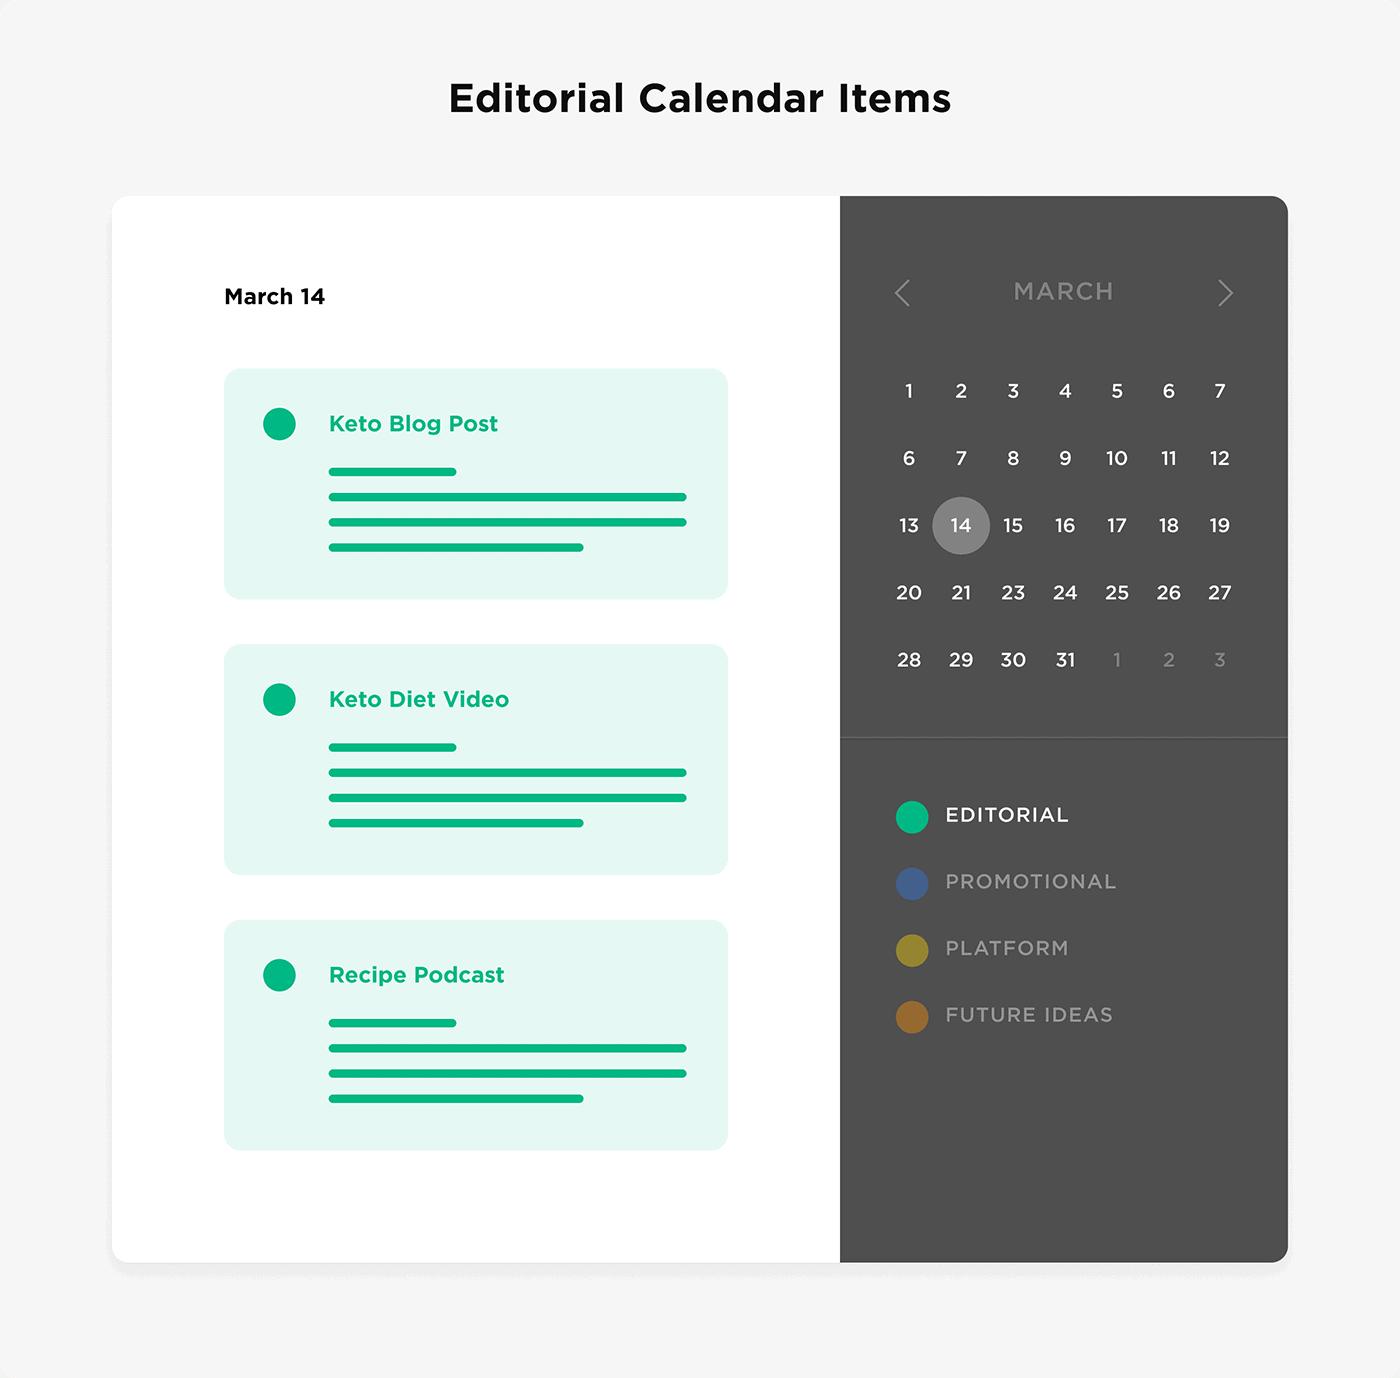 Editorial calendar items